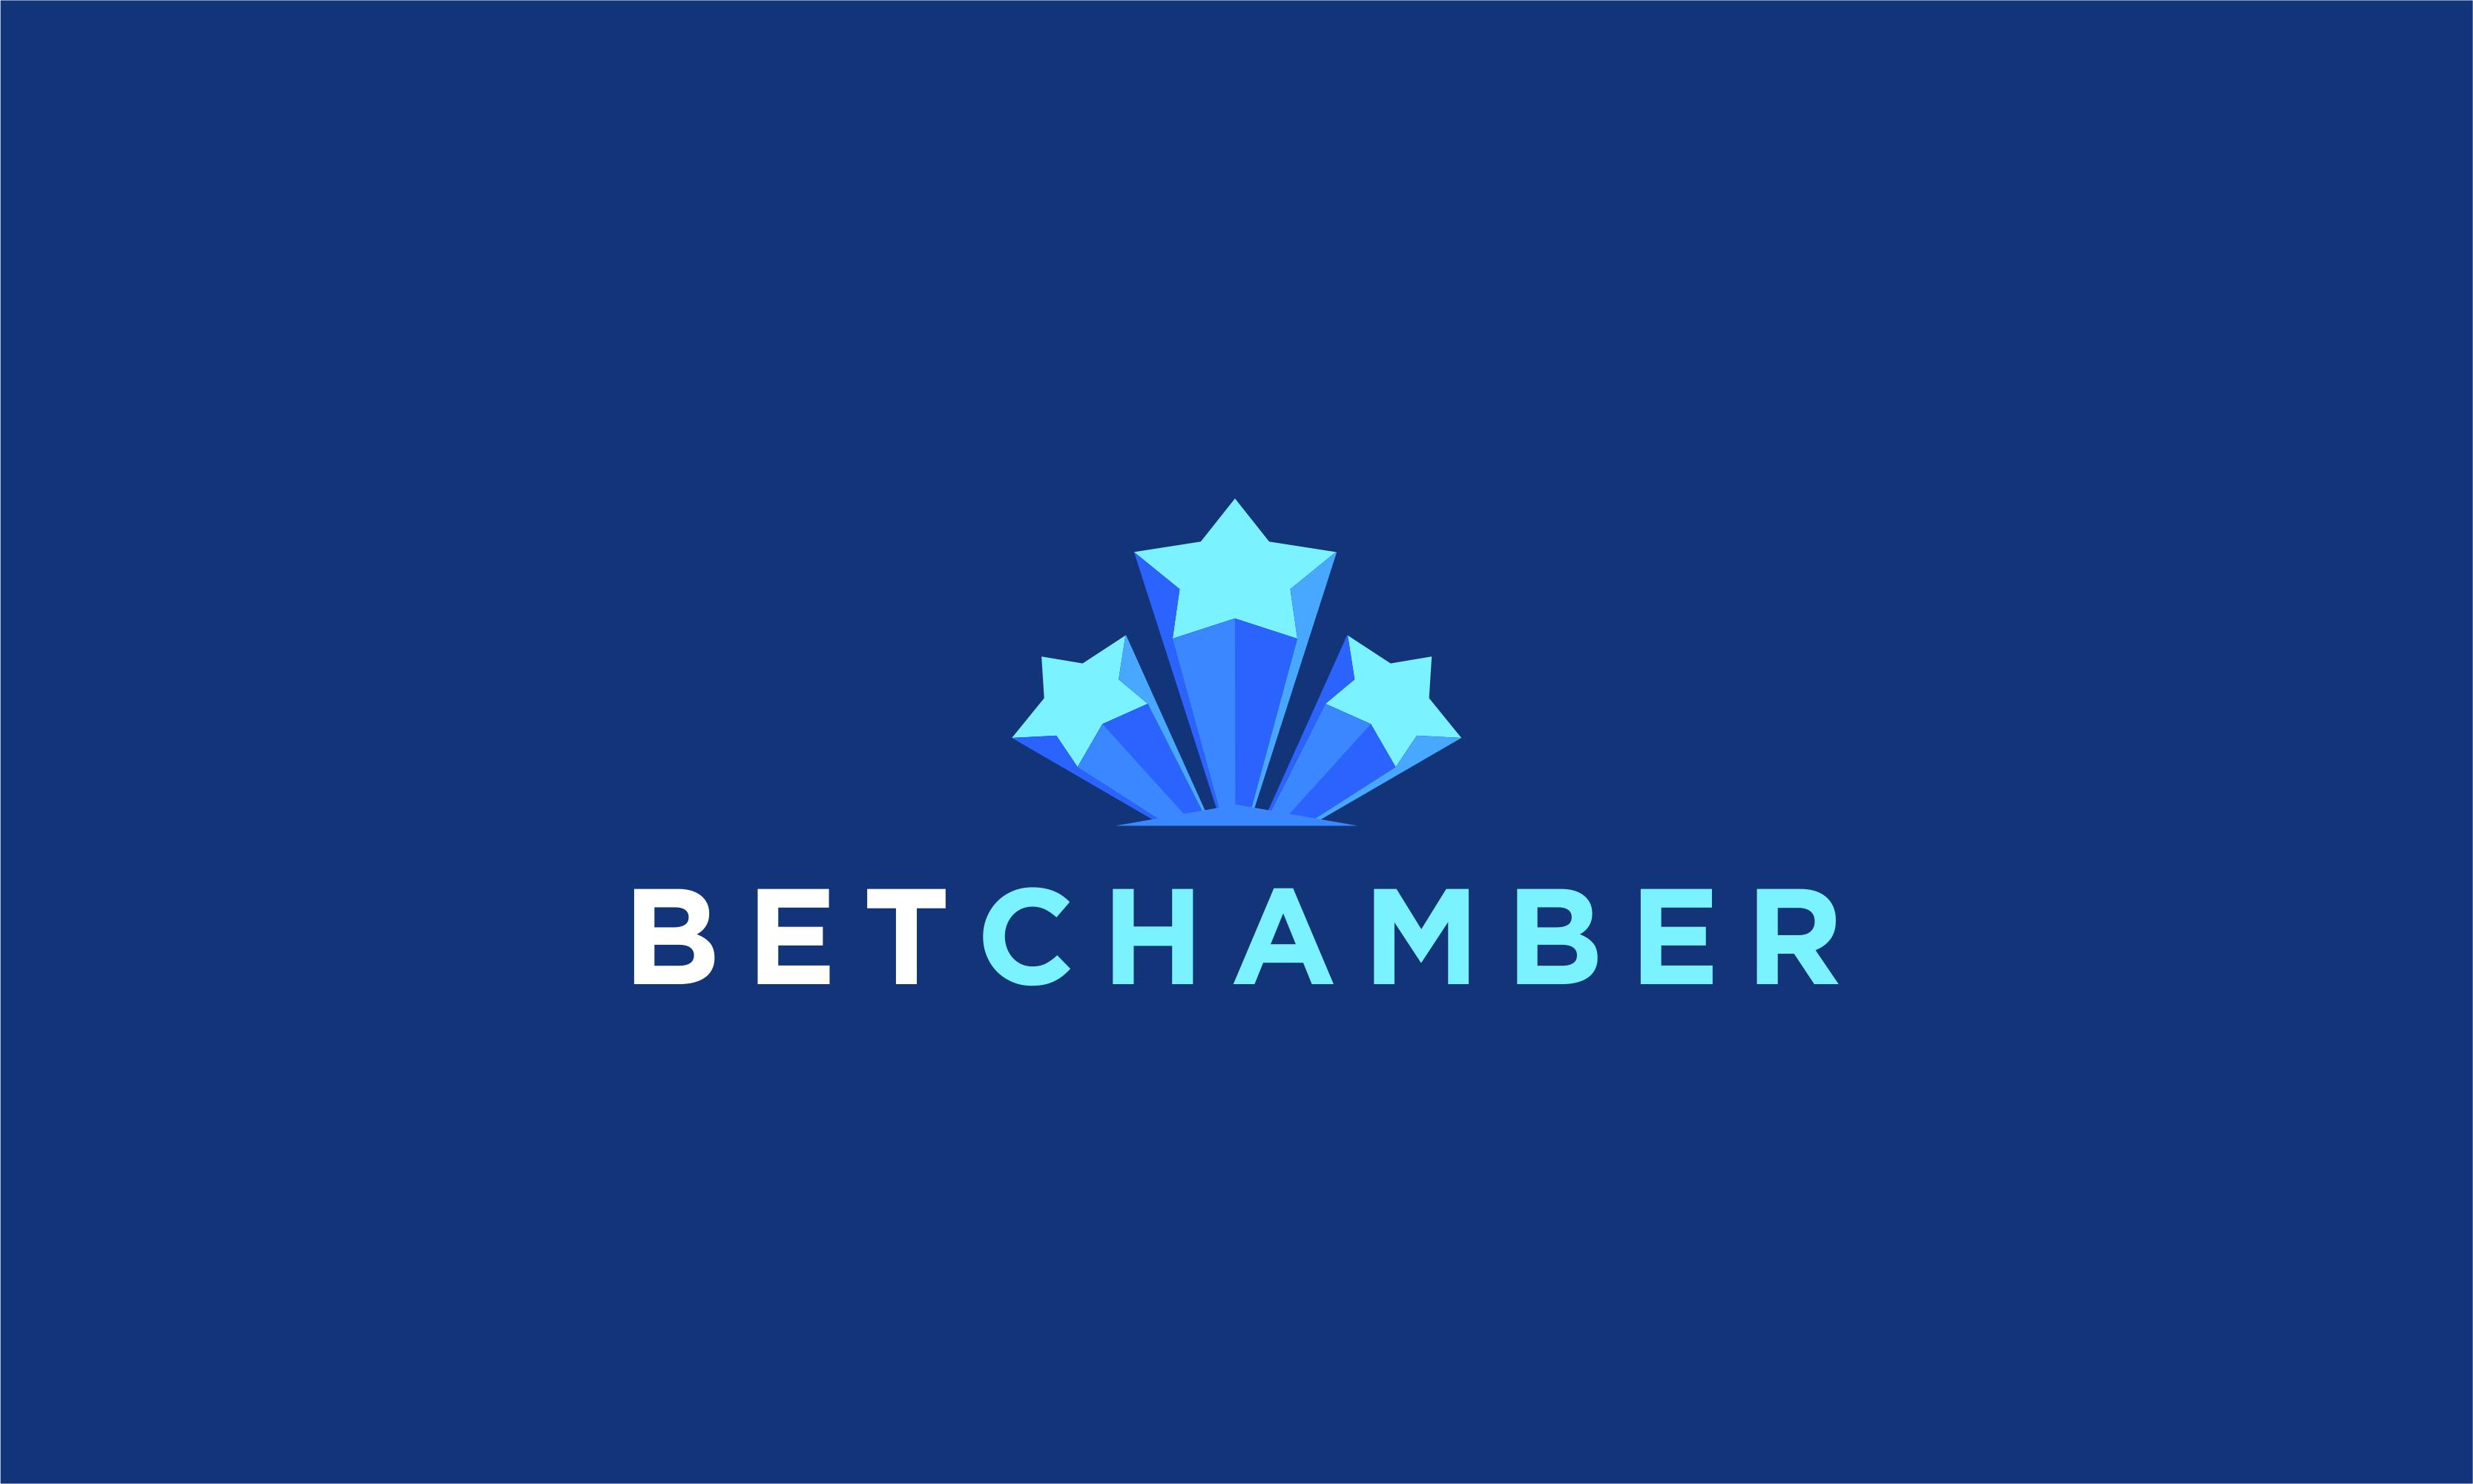 Betchamber